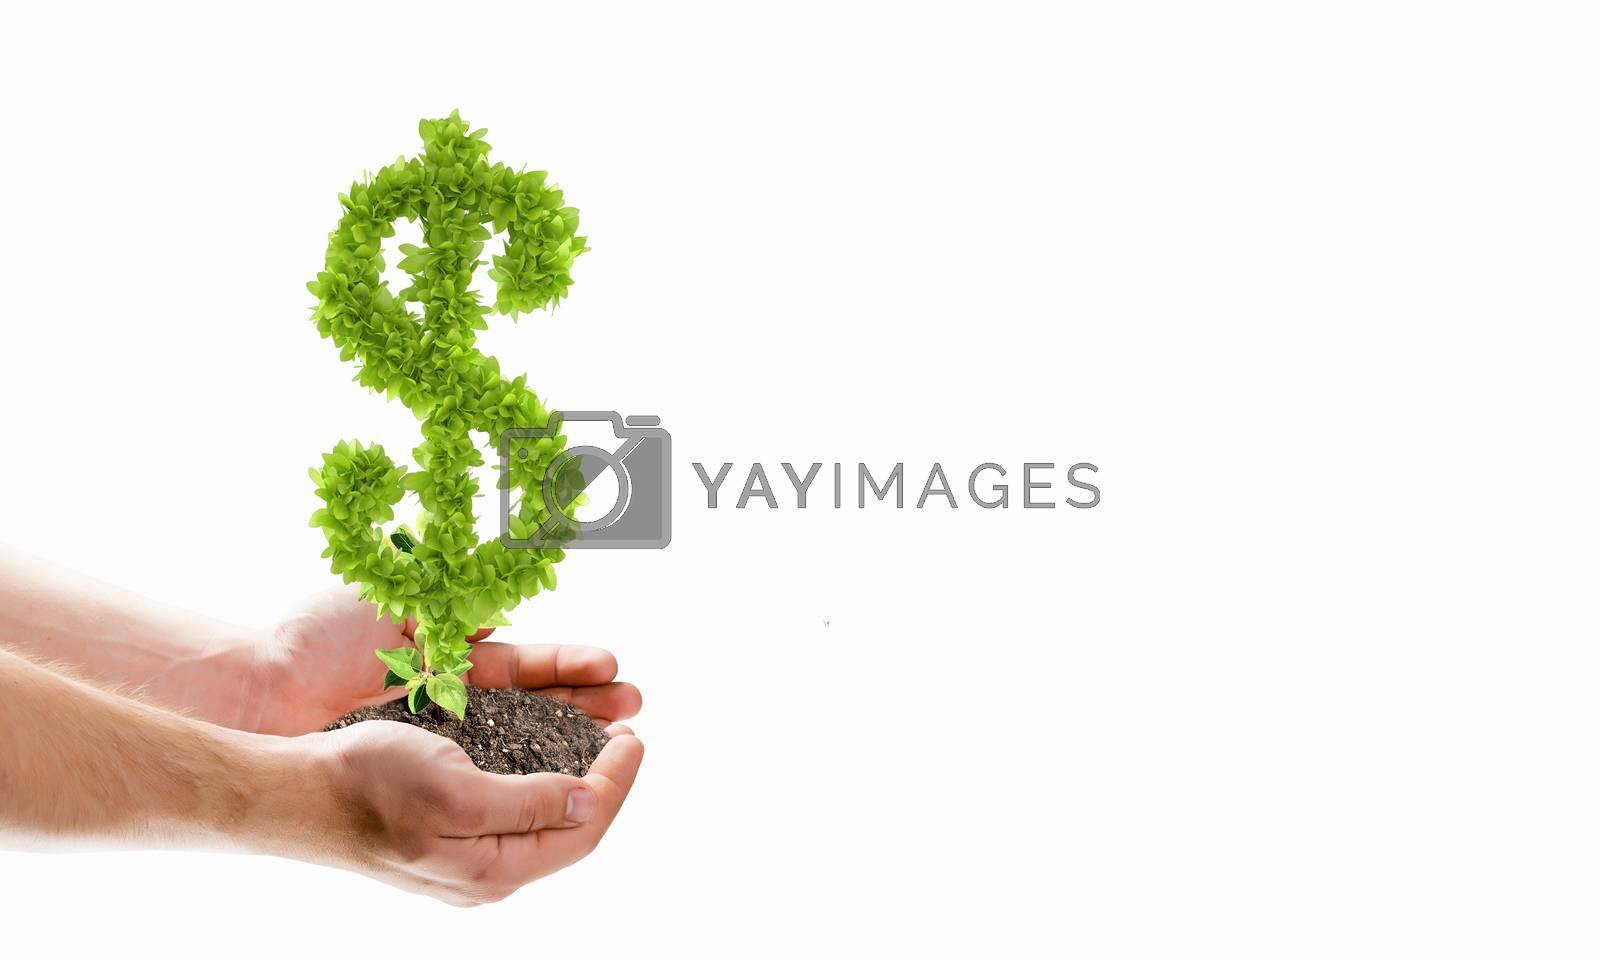 Image of human hands holding plant shaped like dollar